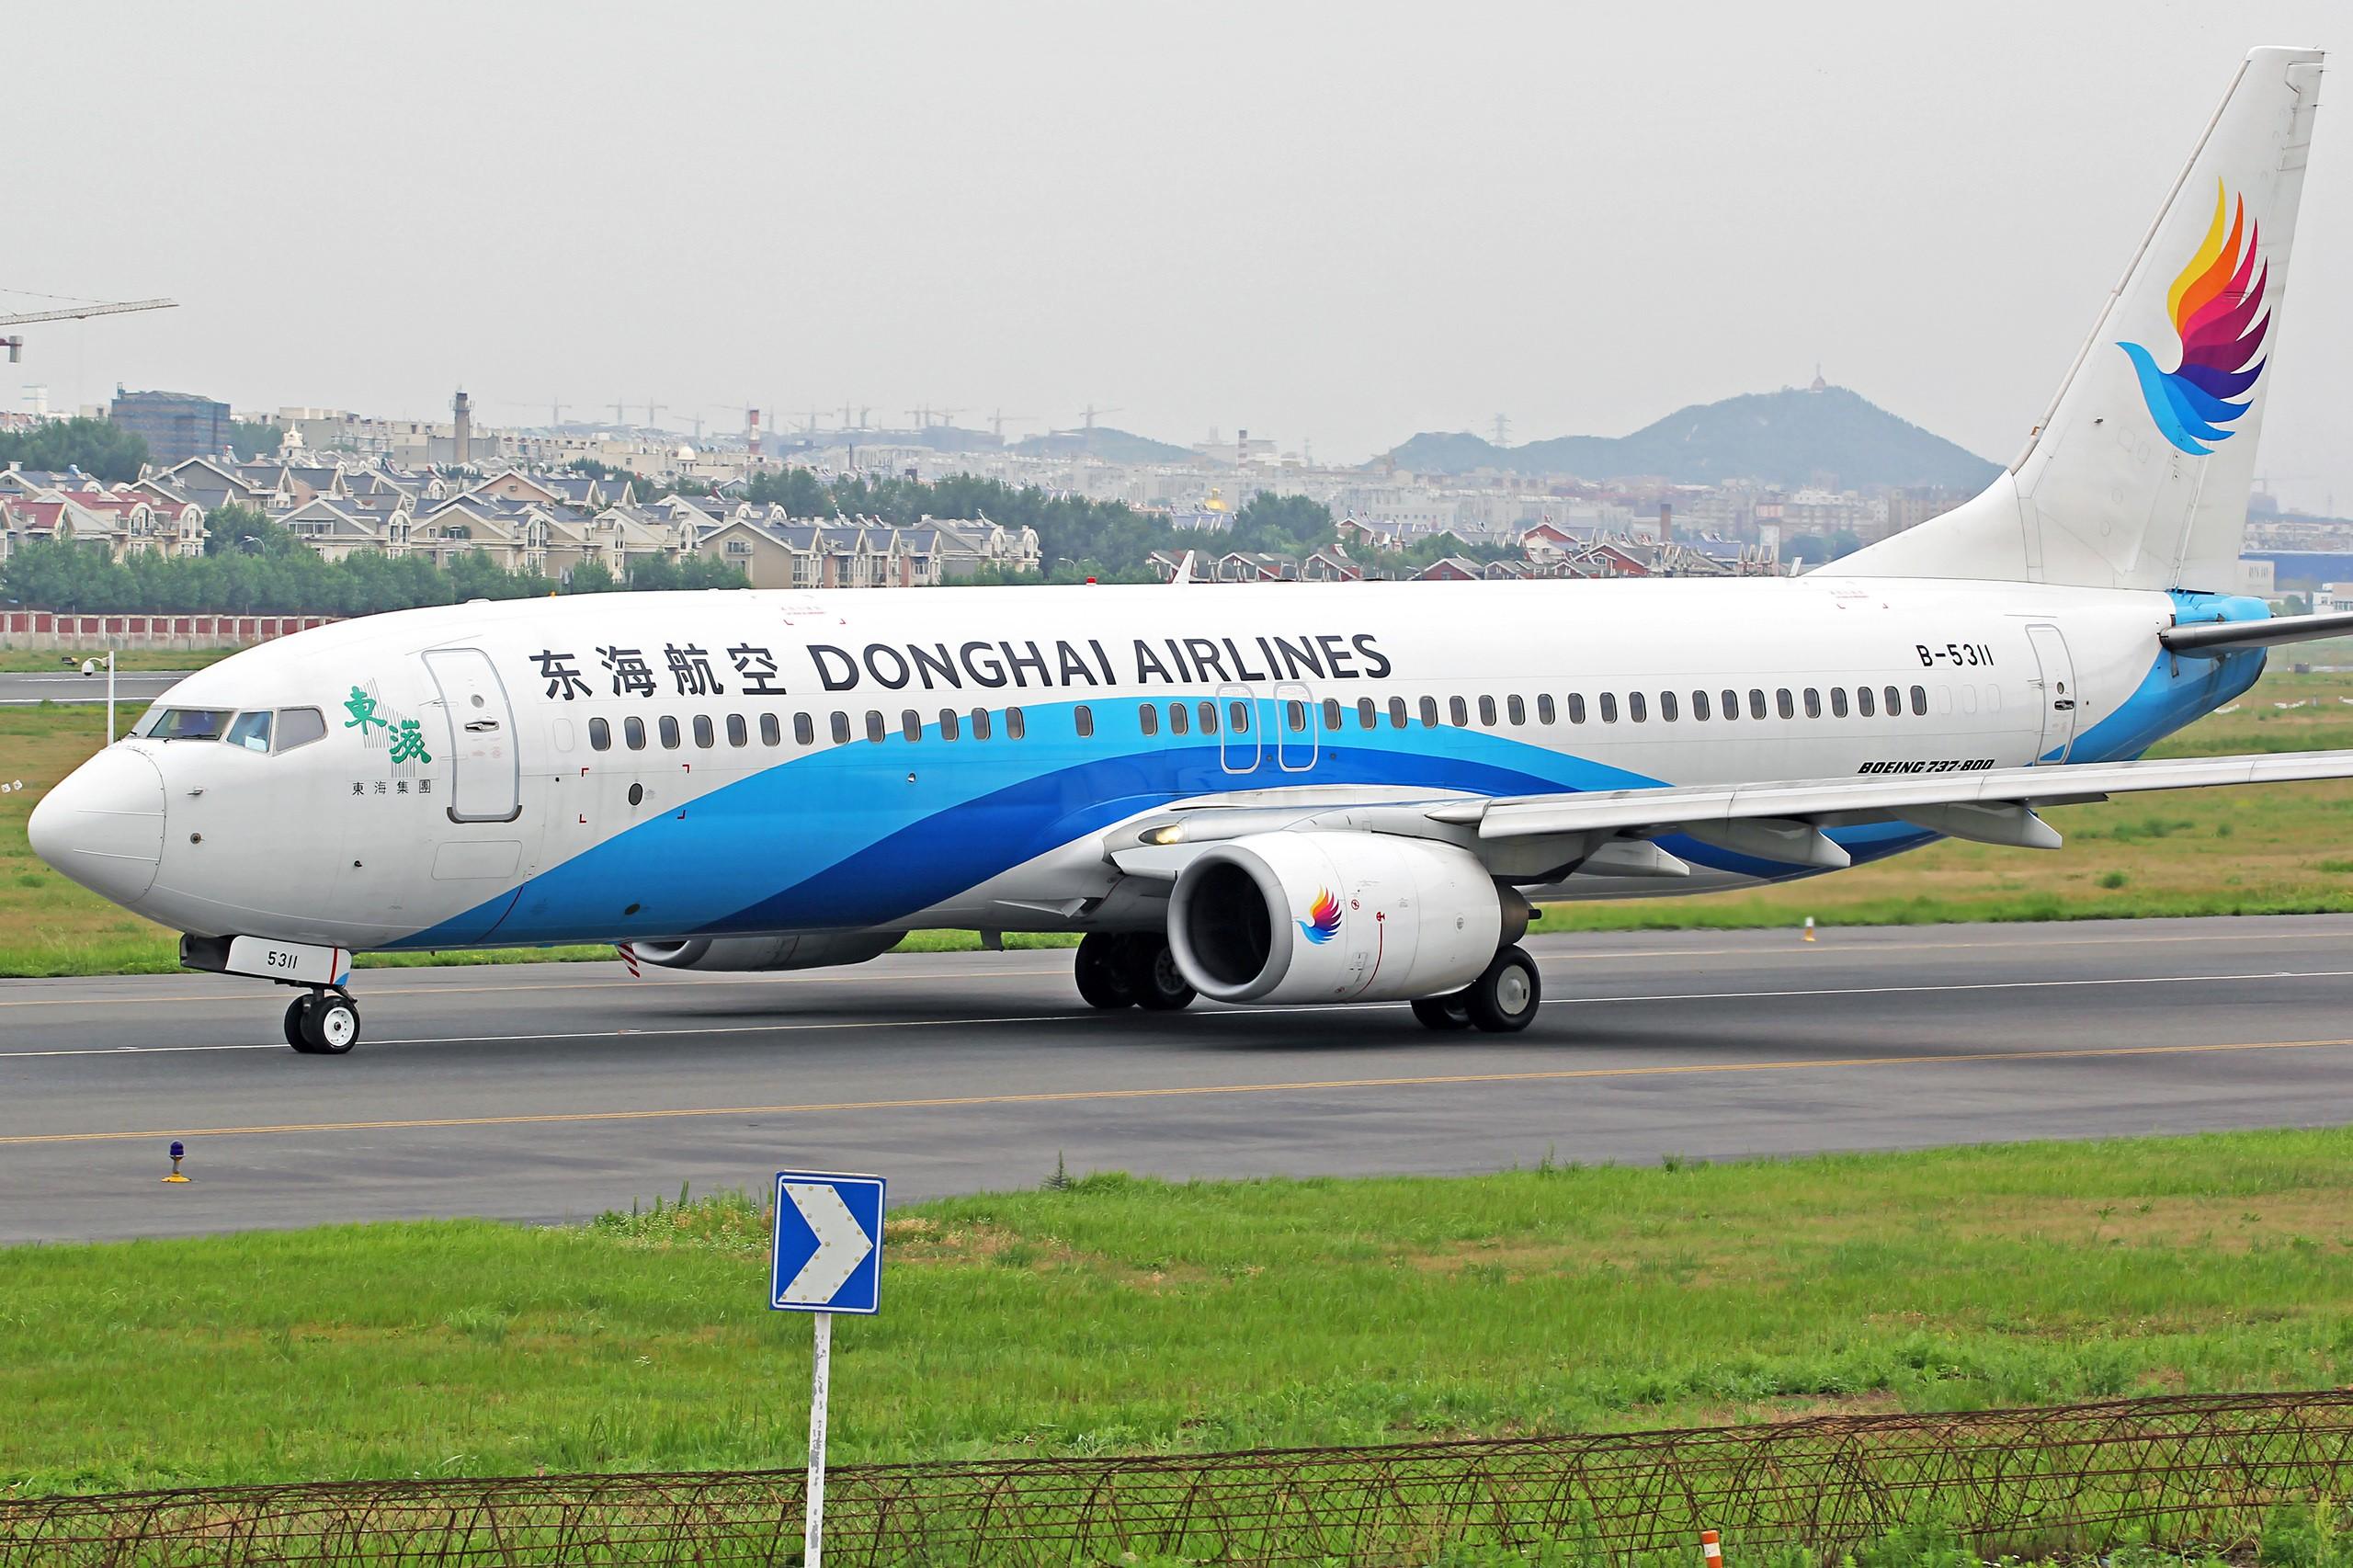 Re:[原创][DLC]...窄体机...2560x1707}Pix BOEING 737-800 B-5311 中国大连周水子国际机场